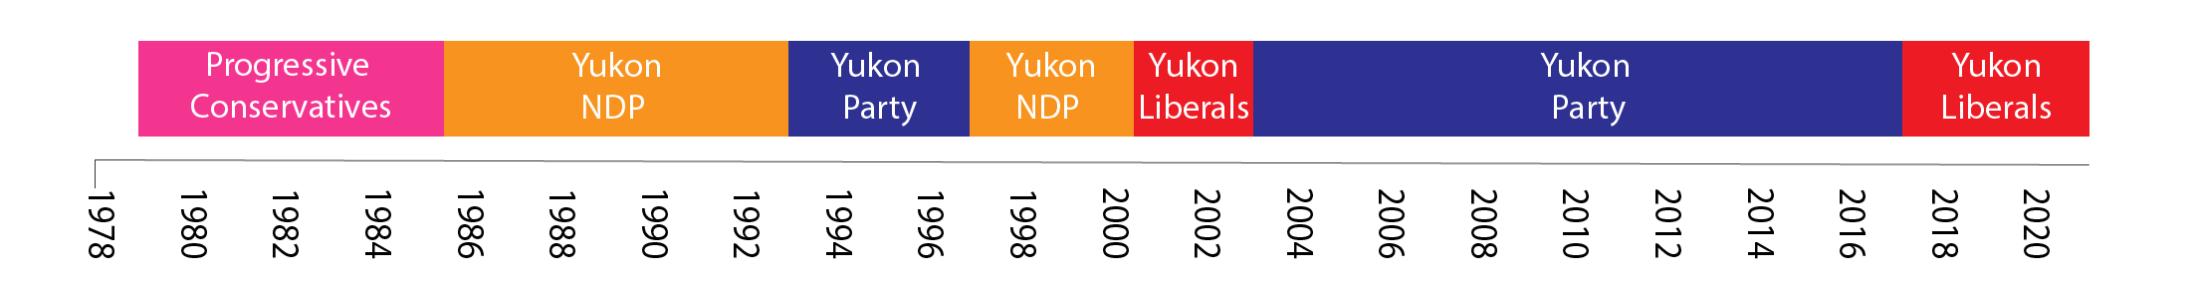 Yukon government timeline